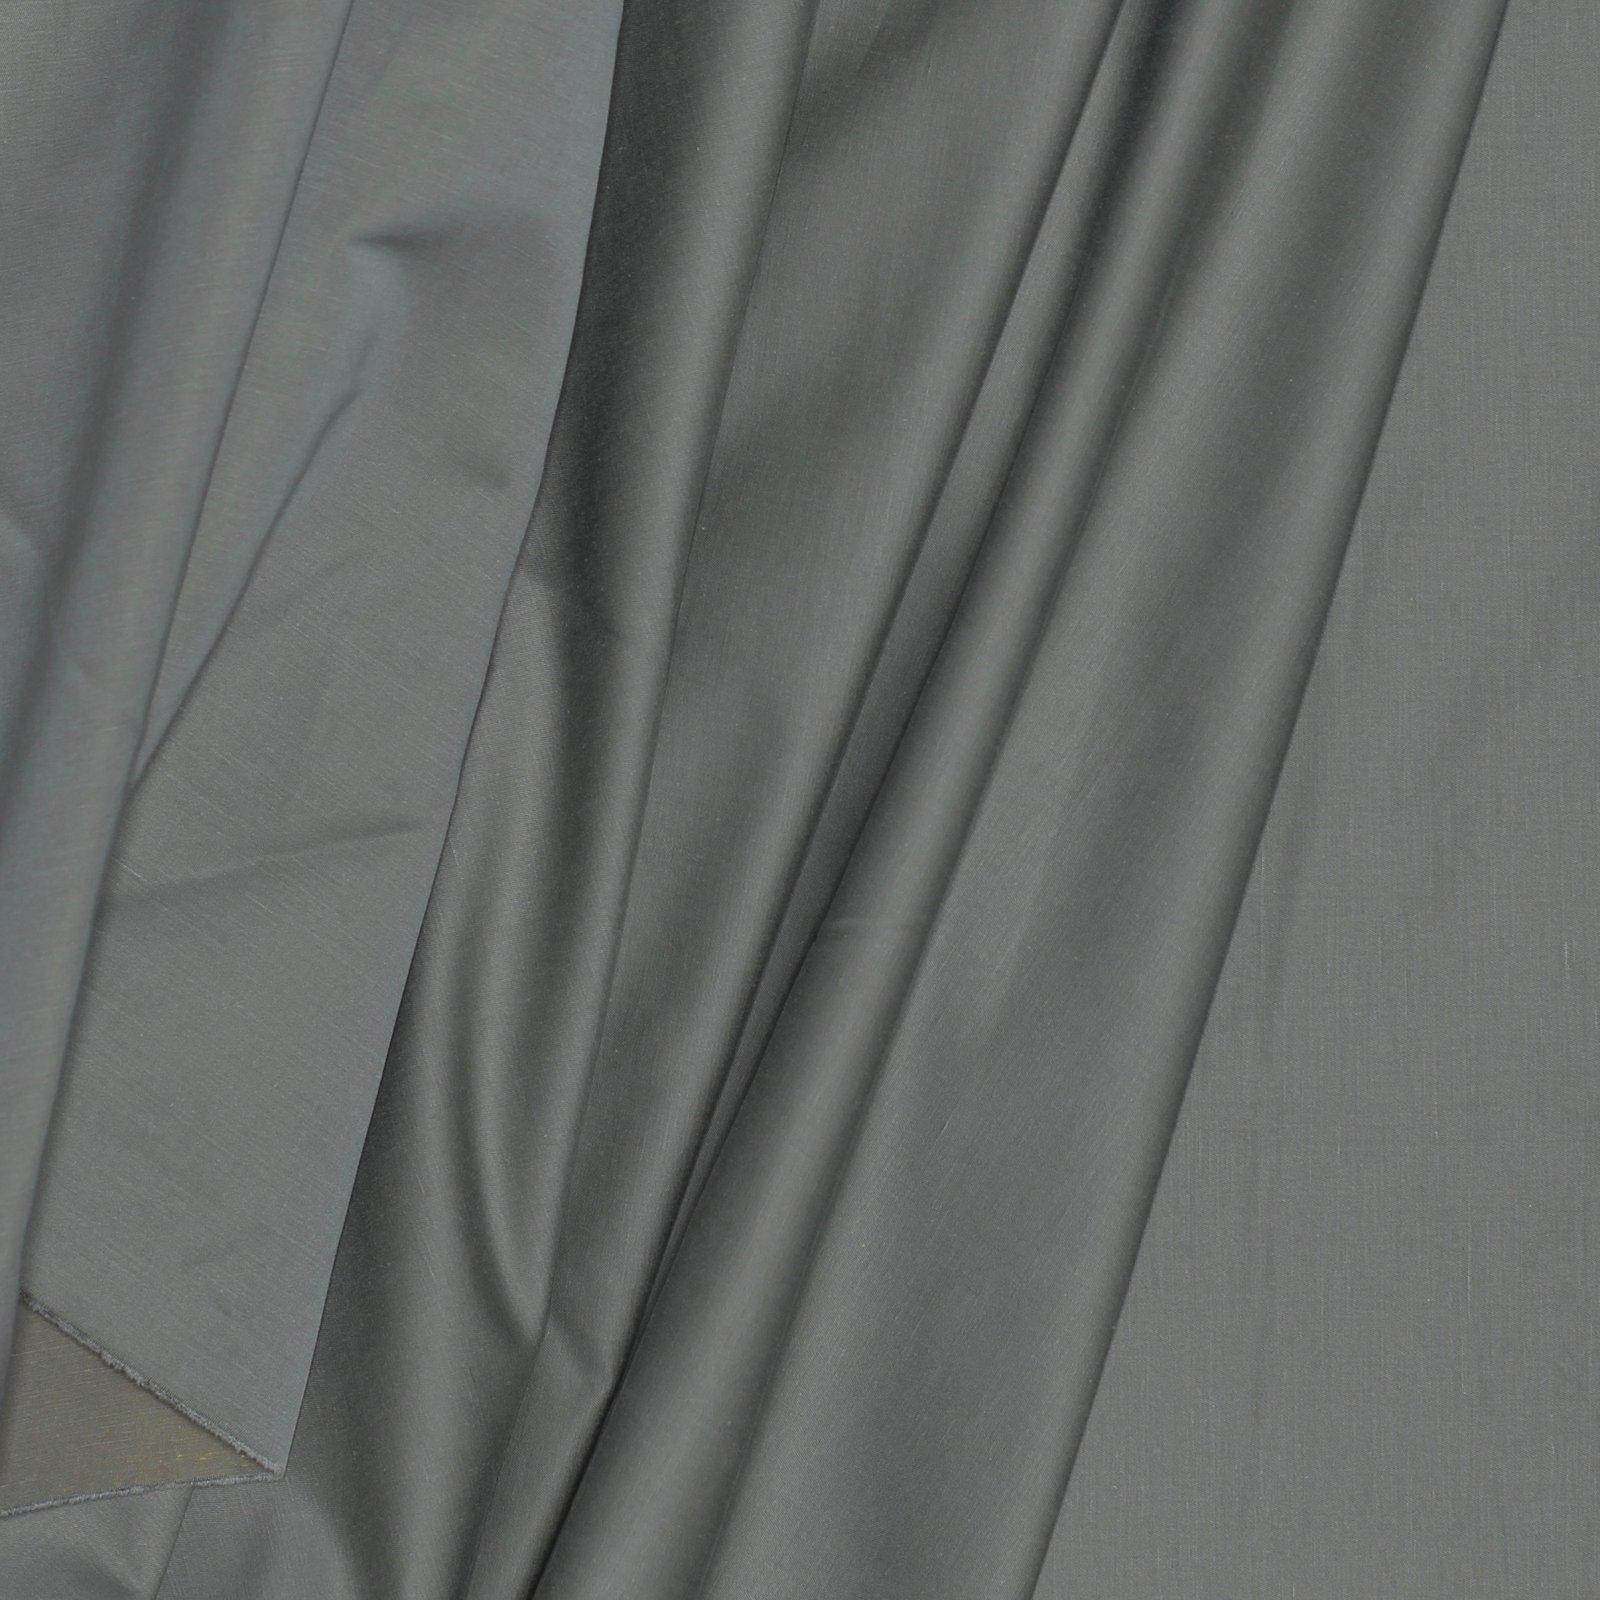 Tan/Yellow Crossweave Italian Cotton/Linen Blend